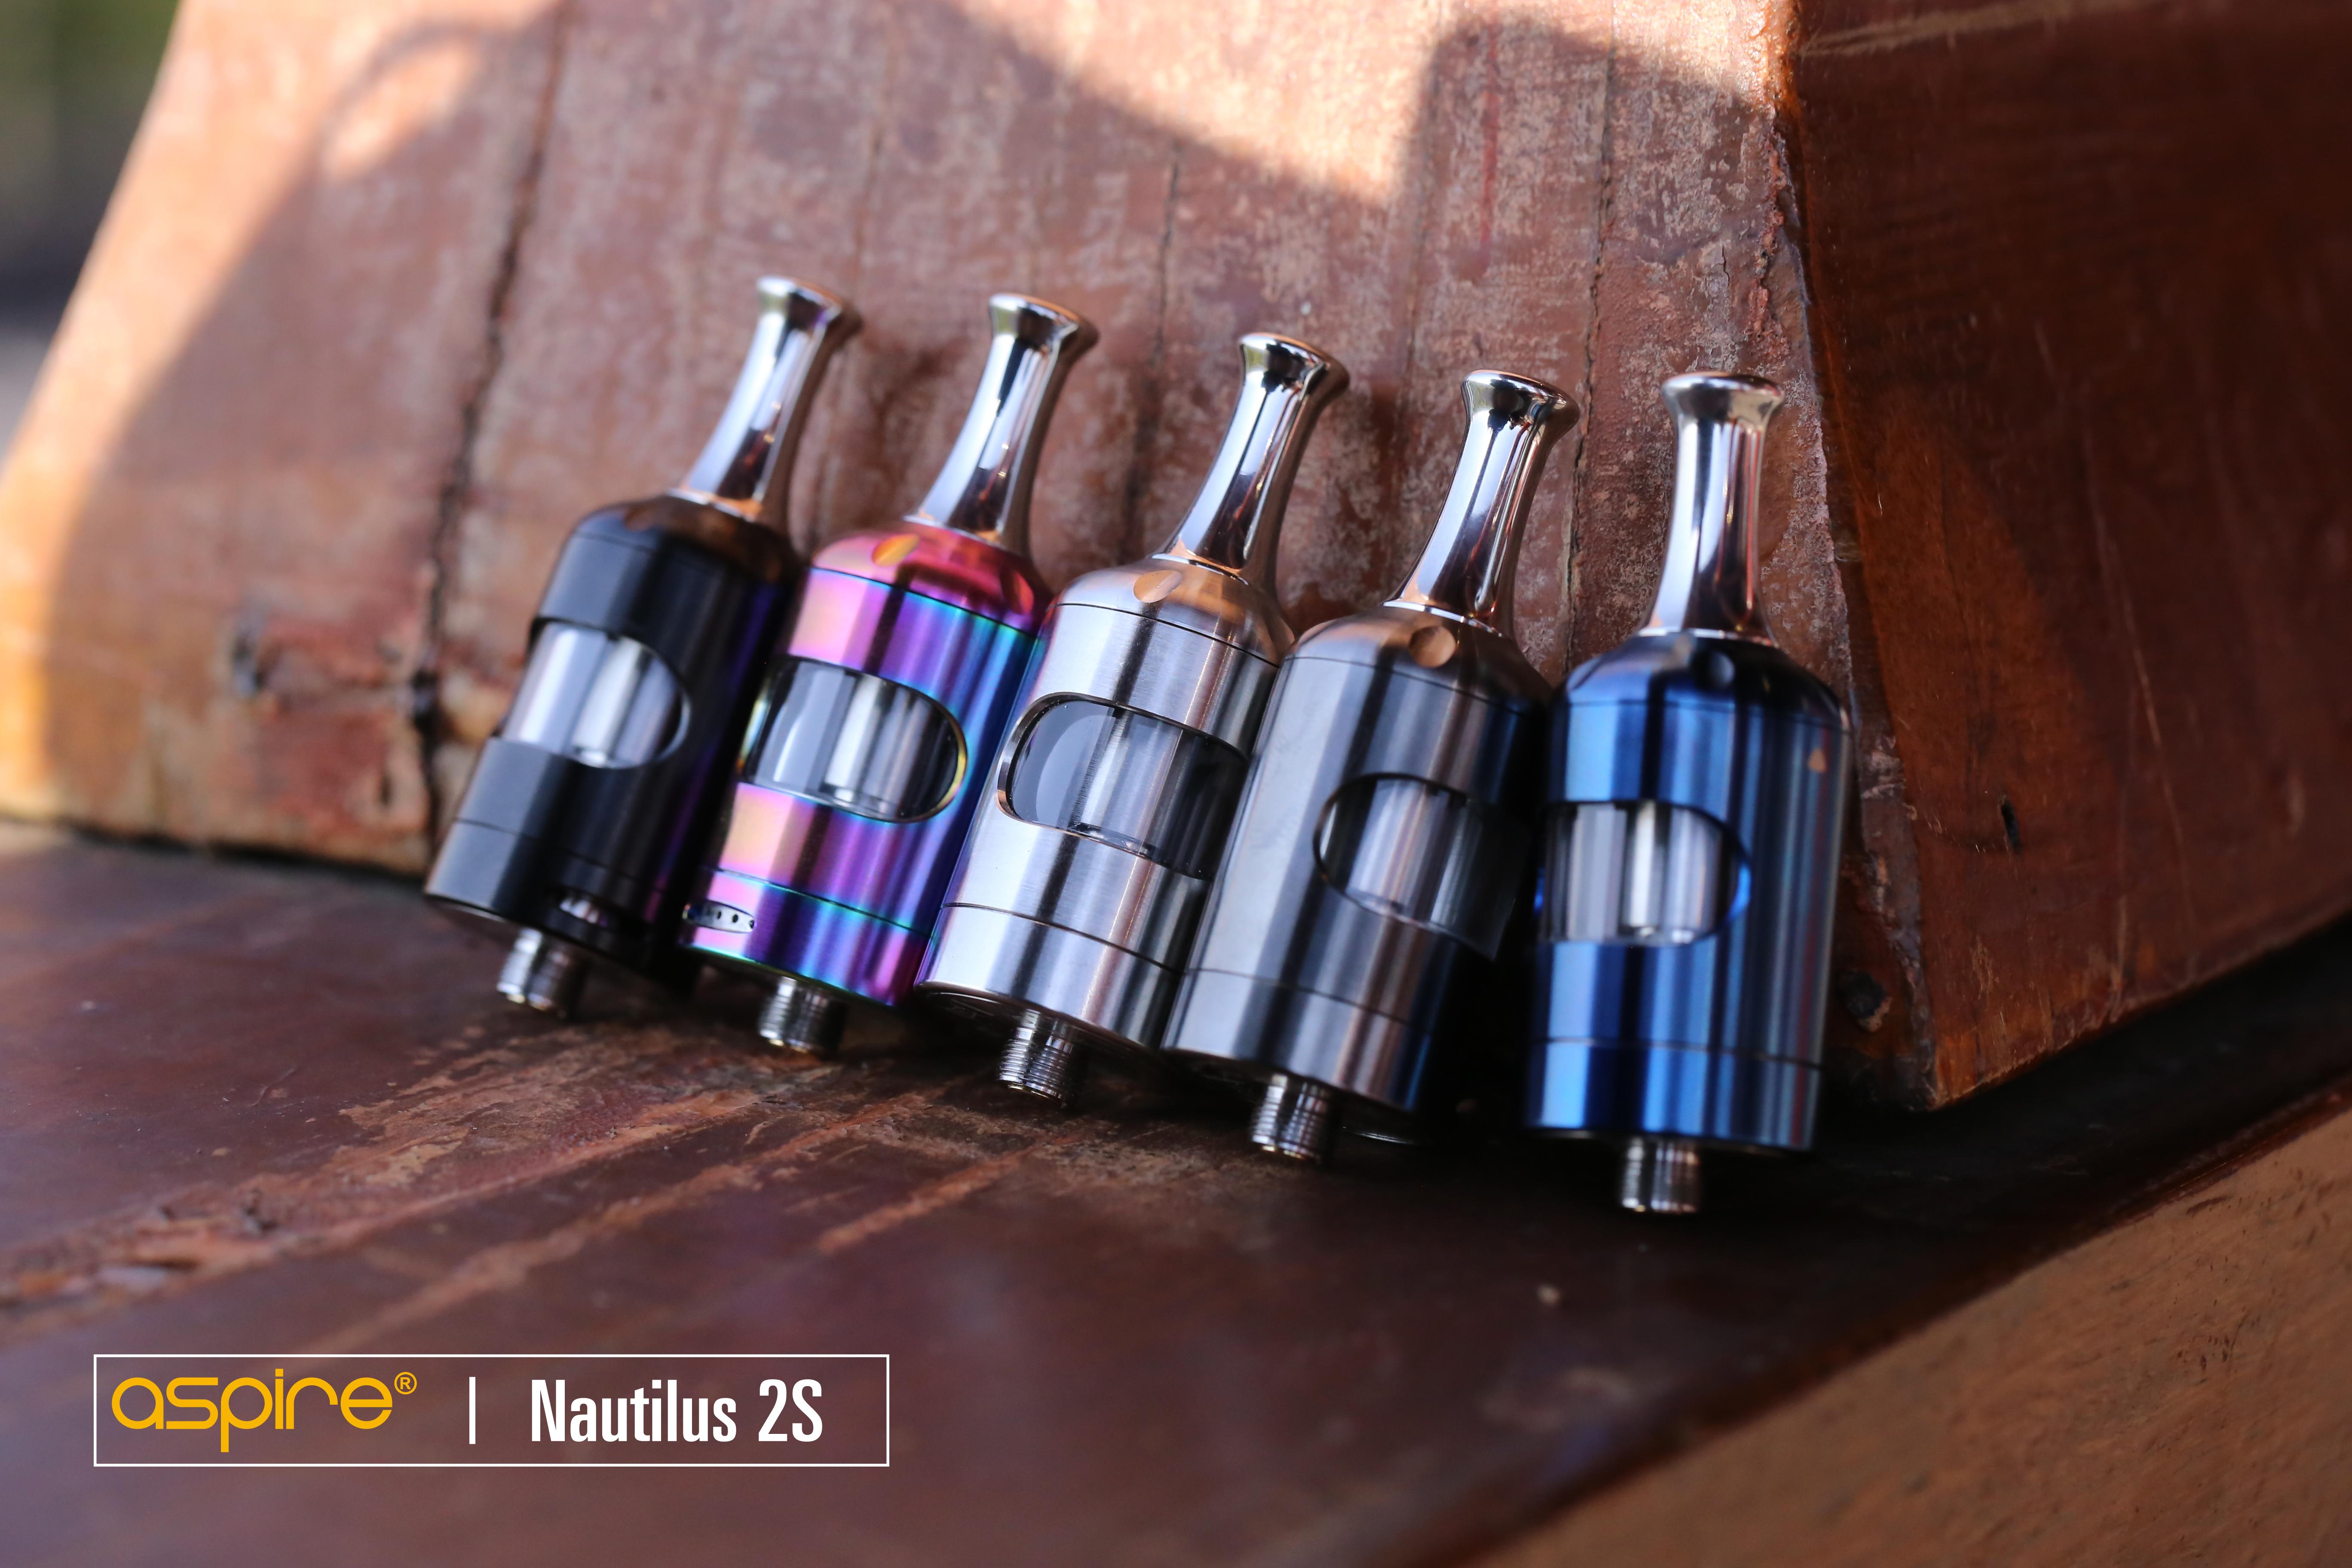 Aspire Nautils 2S